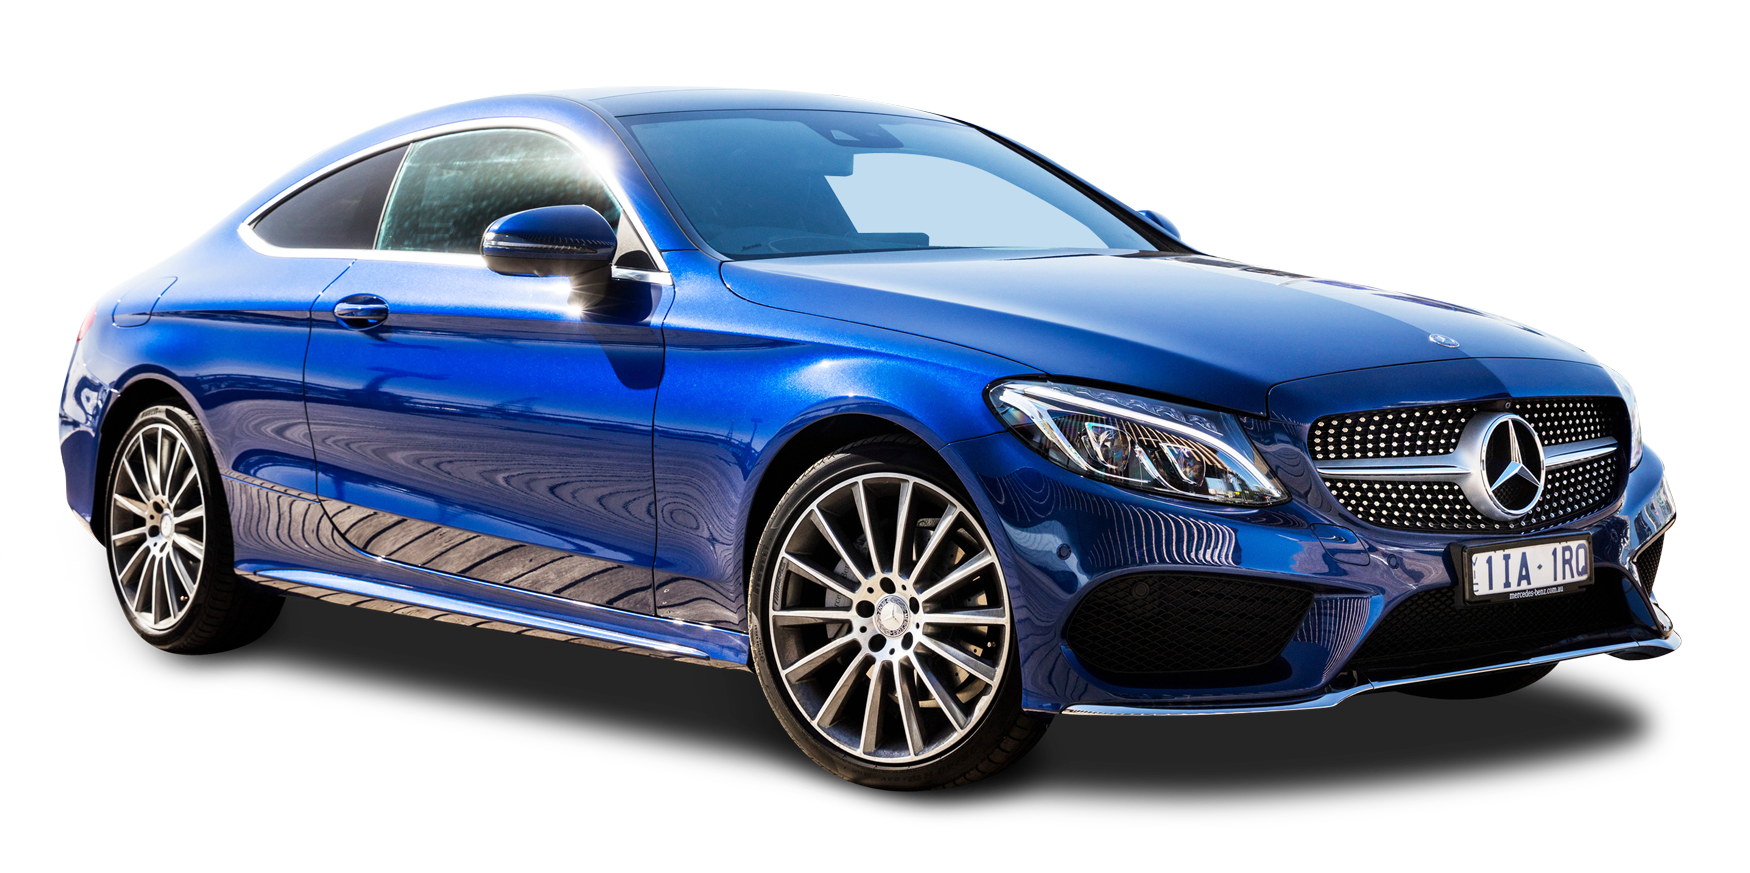 Mercedes Benz C Class Blue Car PNG Image